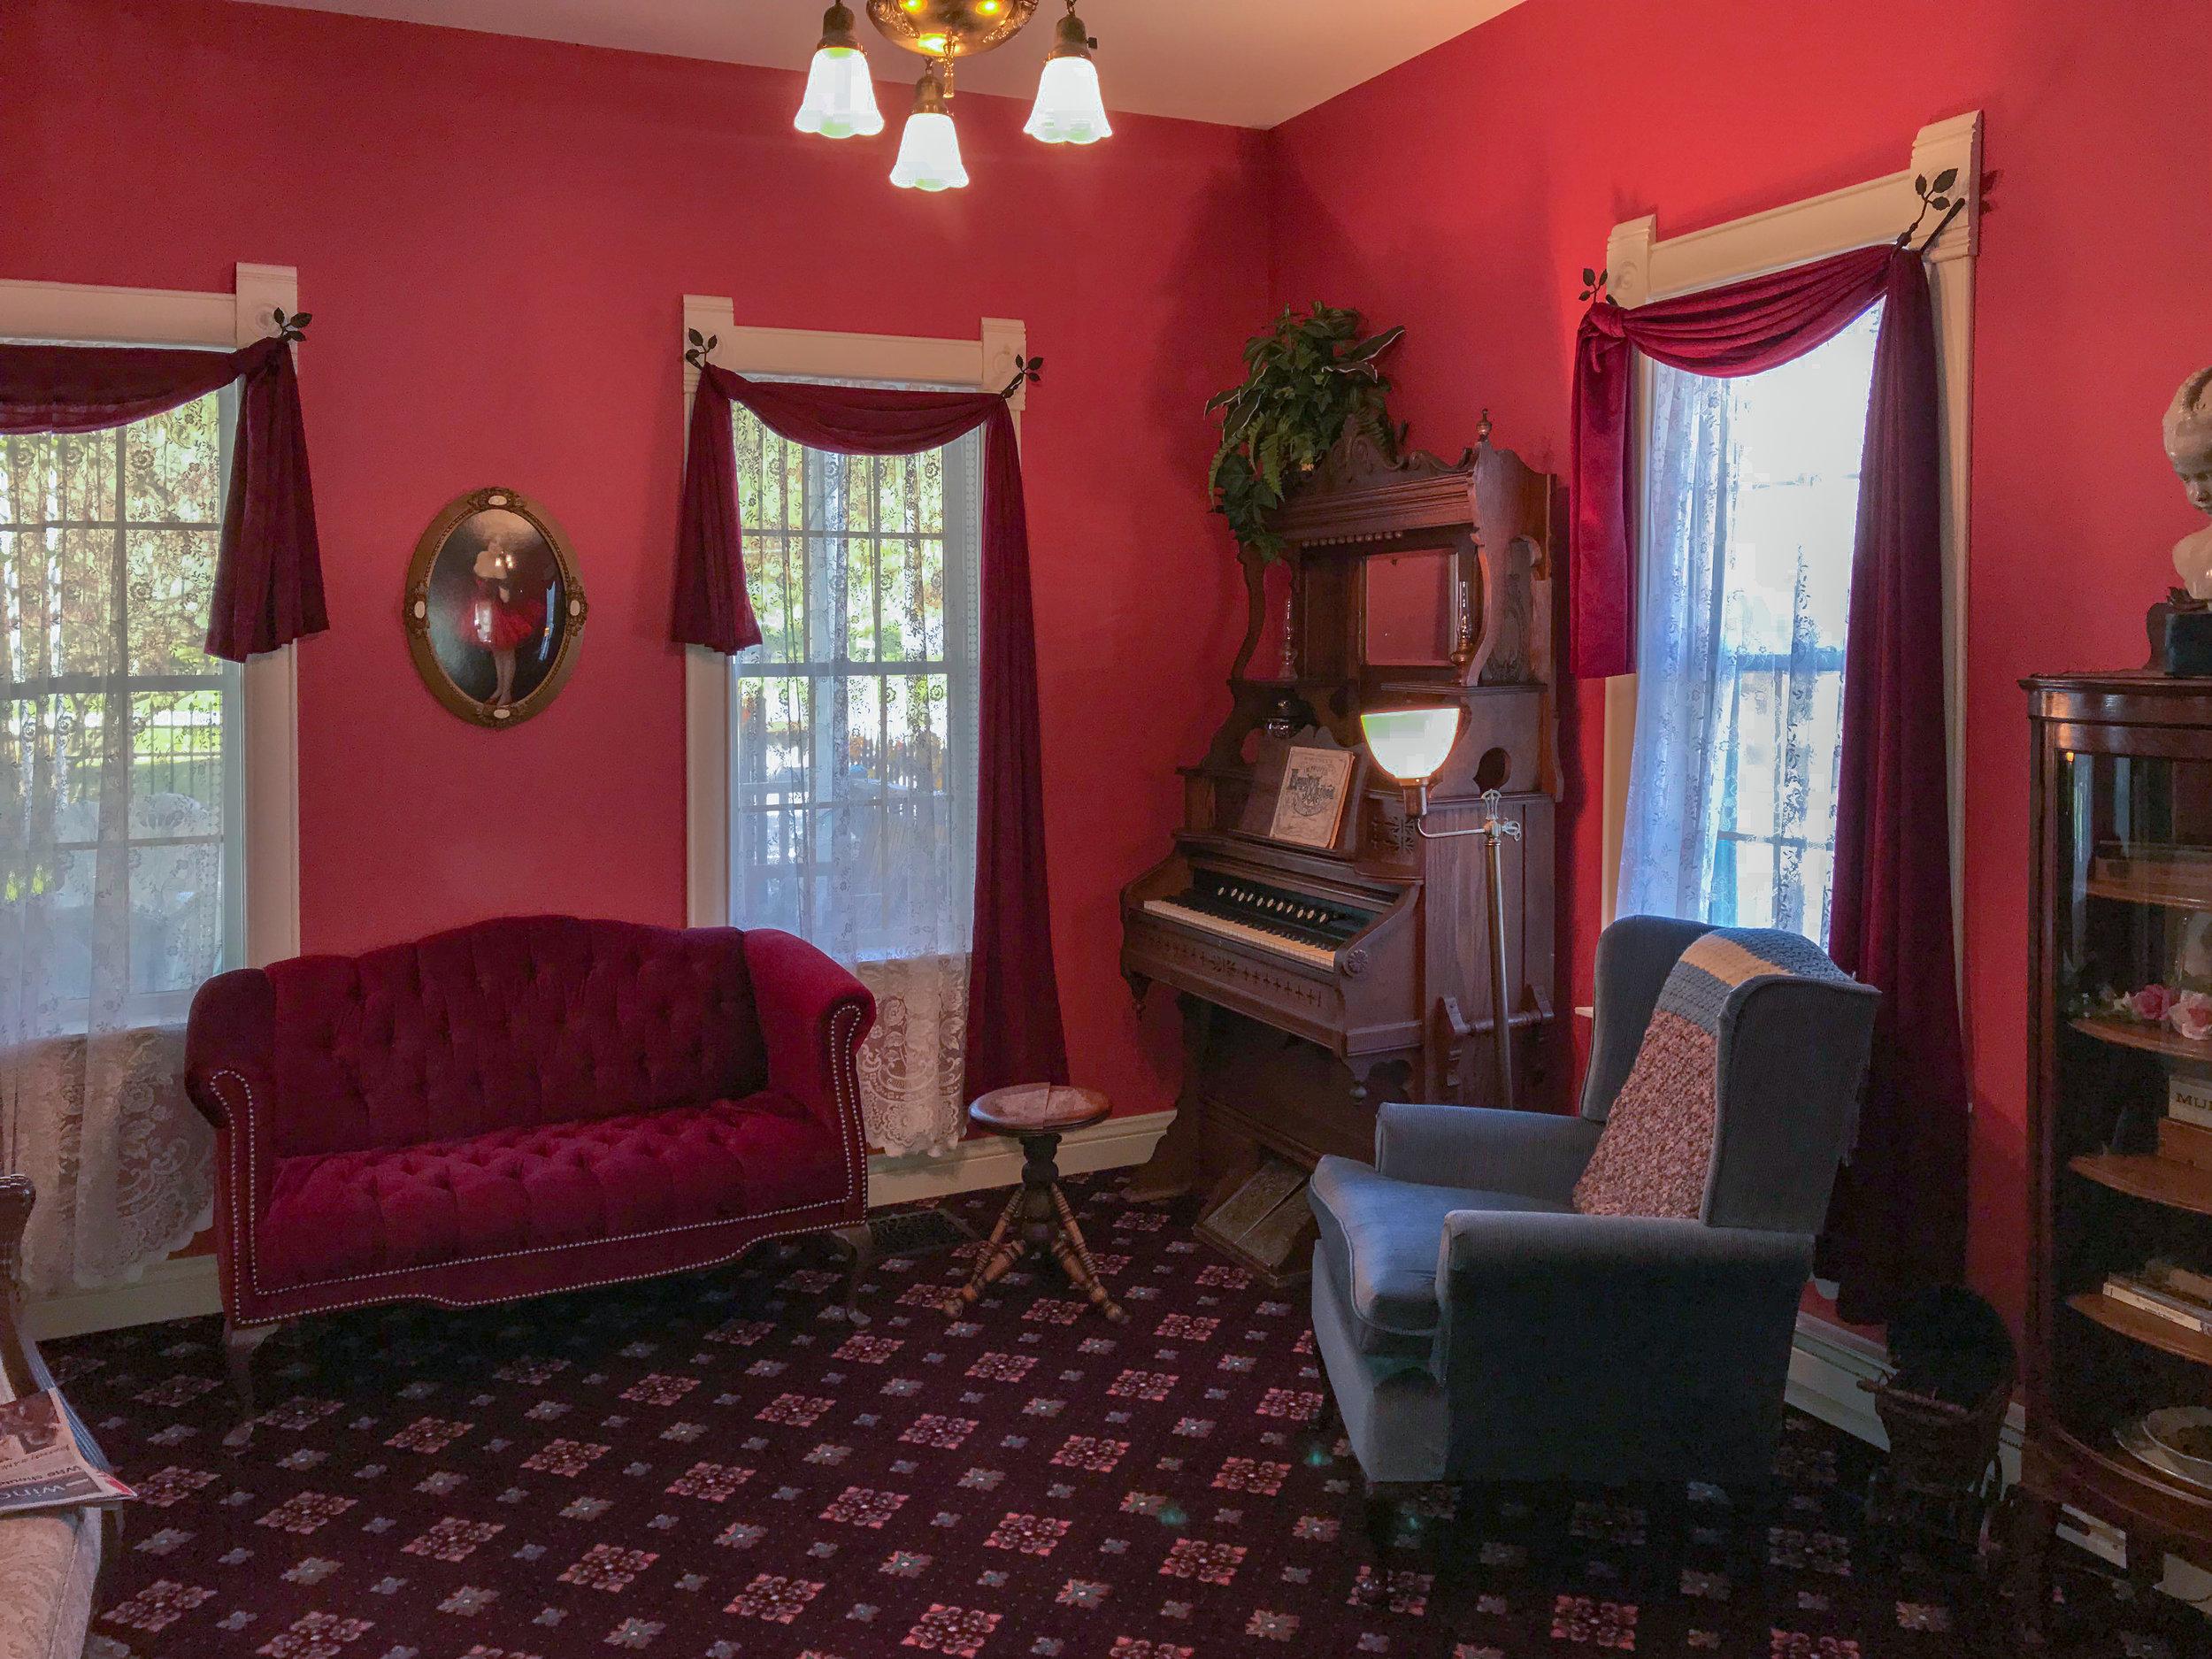 awi-inside-parlor-room-b.jpg